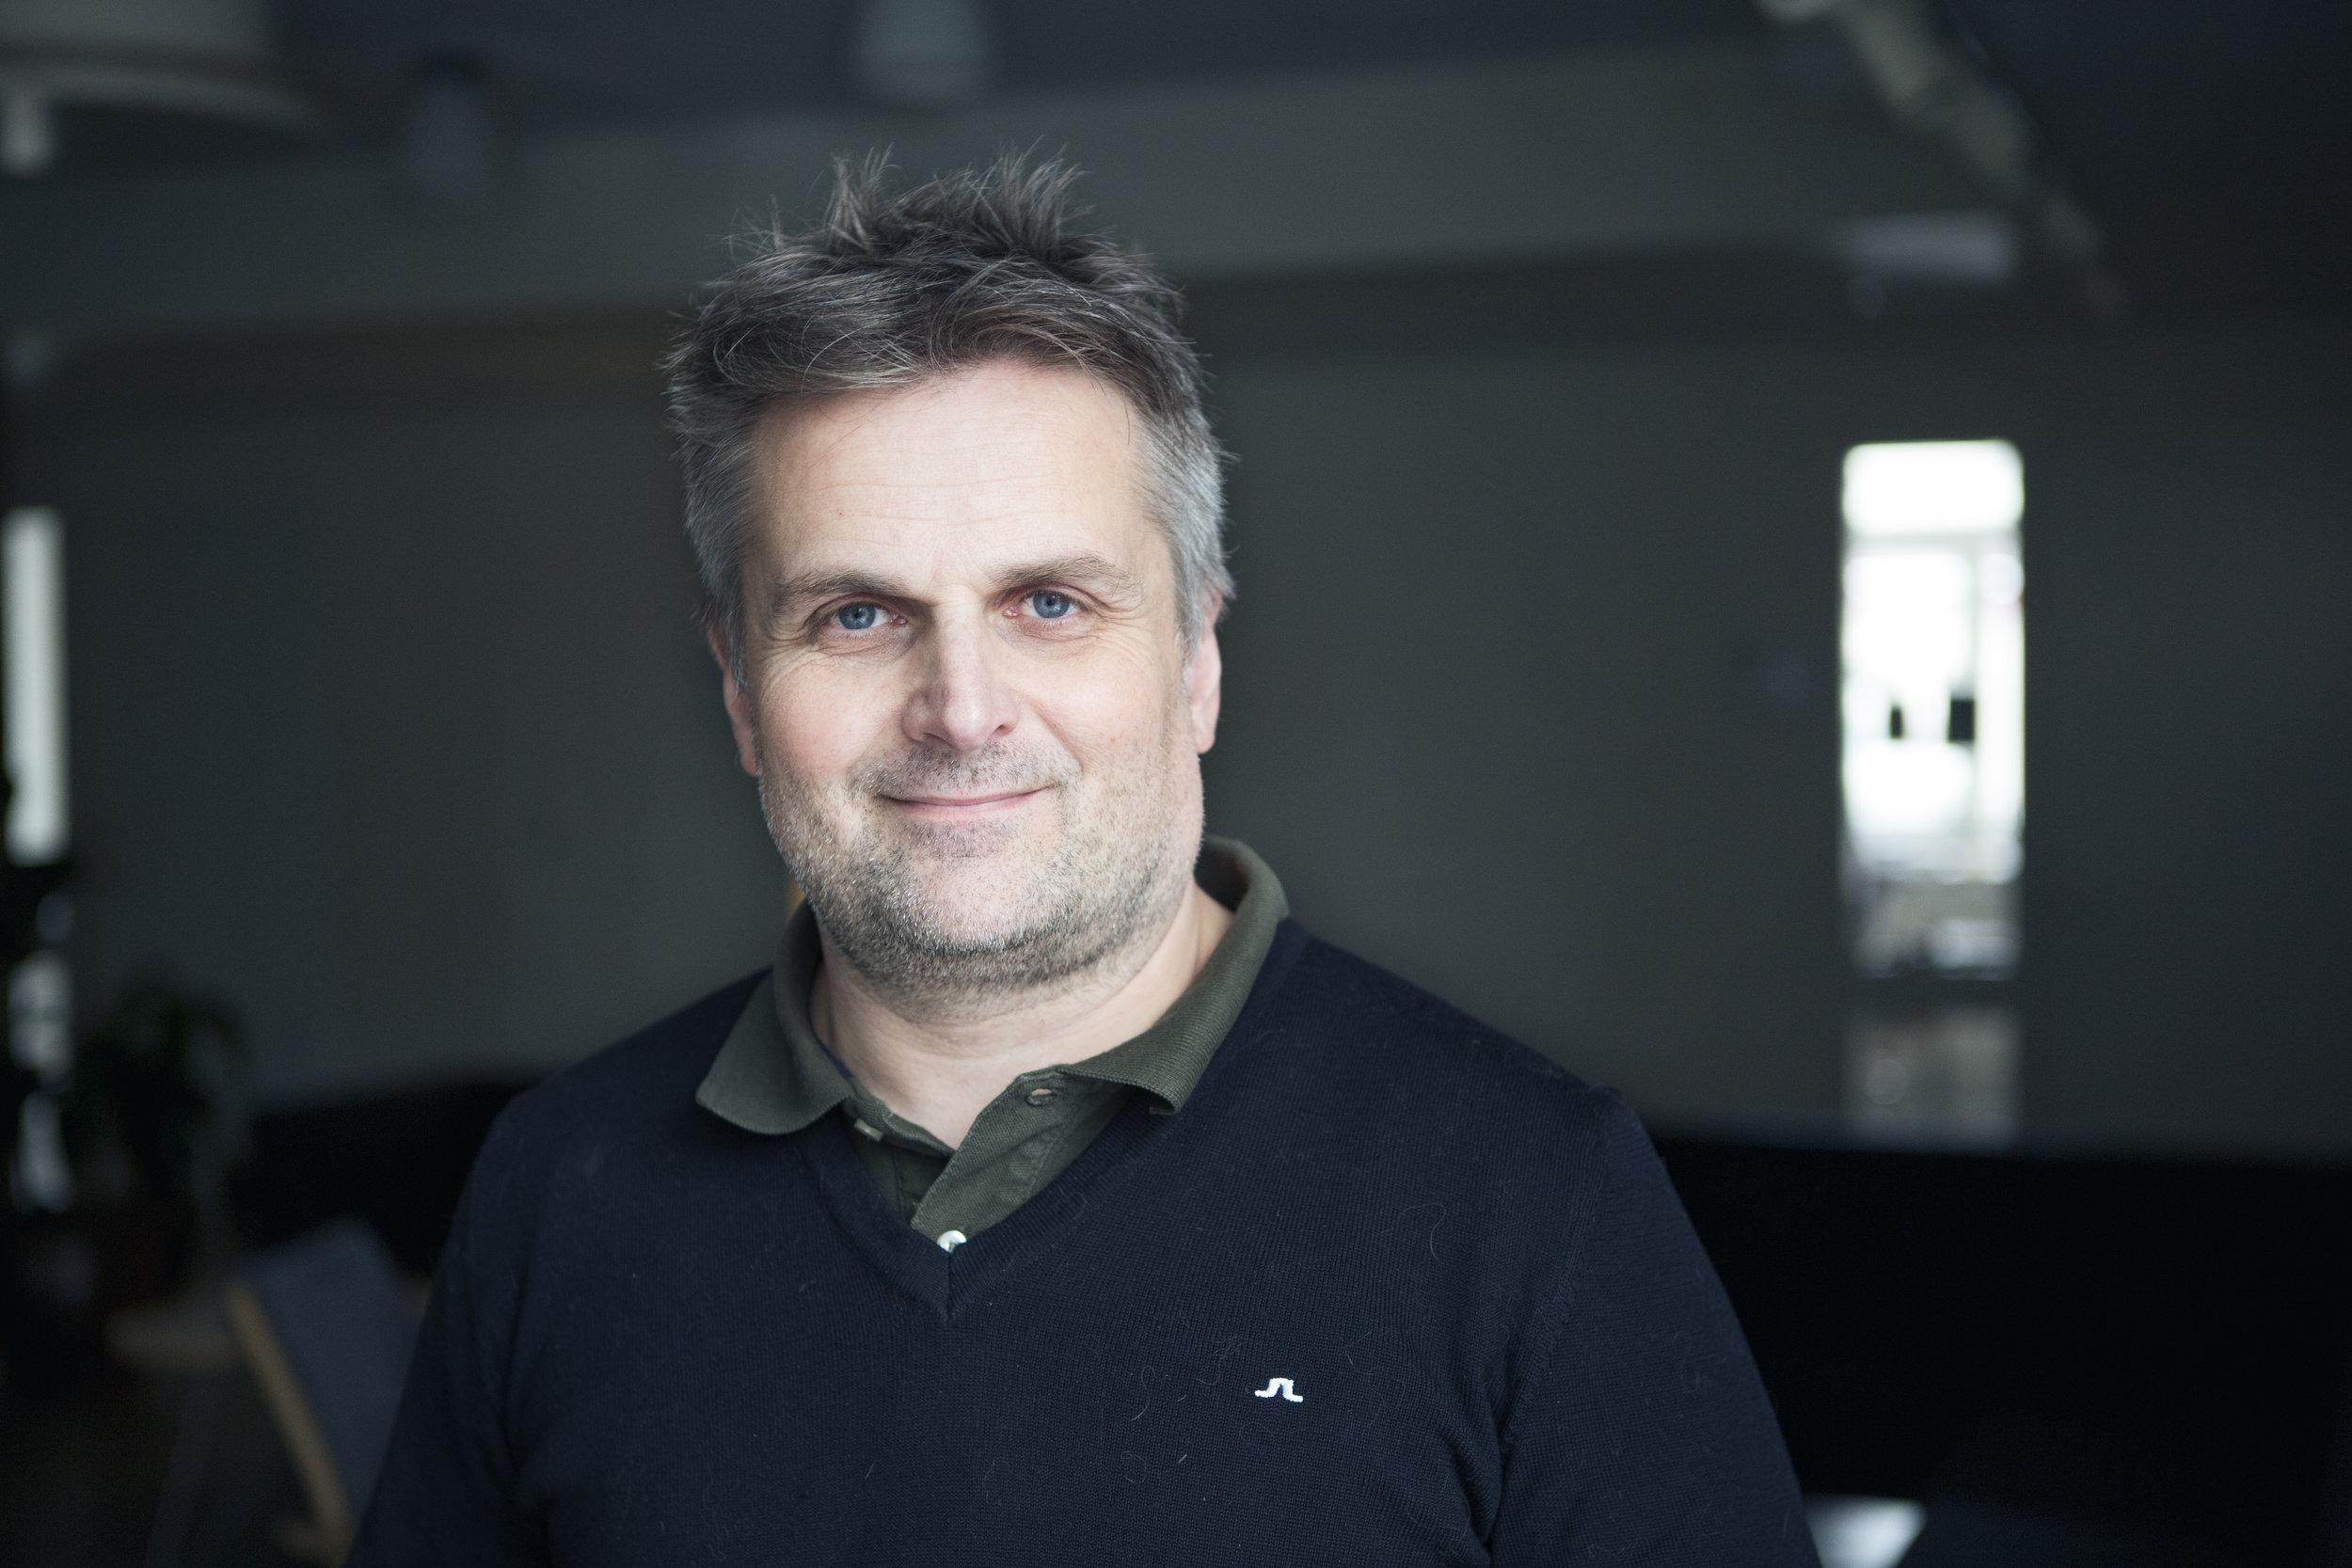 Magnus Hennlock,   IVL Swedish Environmental Research Institute